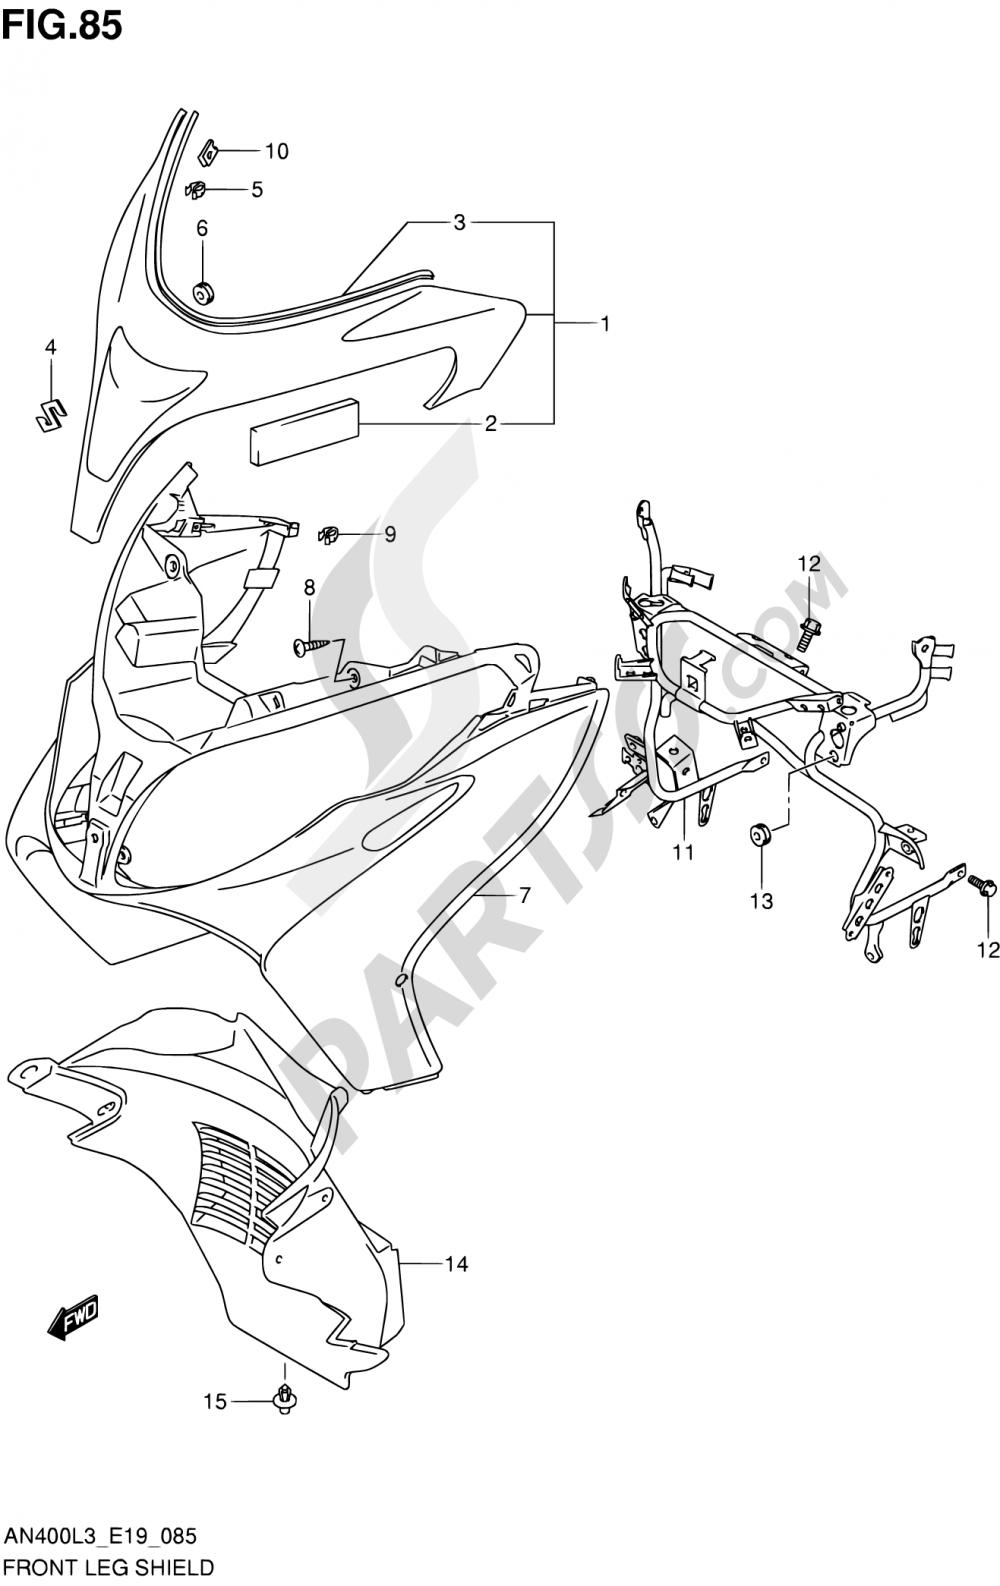 85 - FRONT LEG SHIELD (AN400AL3 E24) Suzuki BURGMAN AN400Z 2013